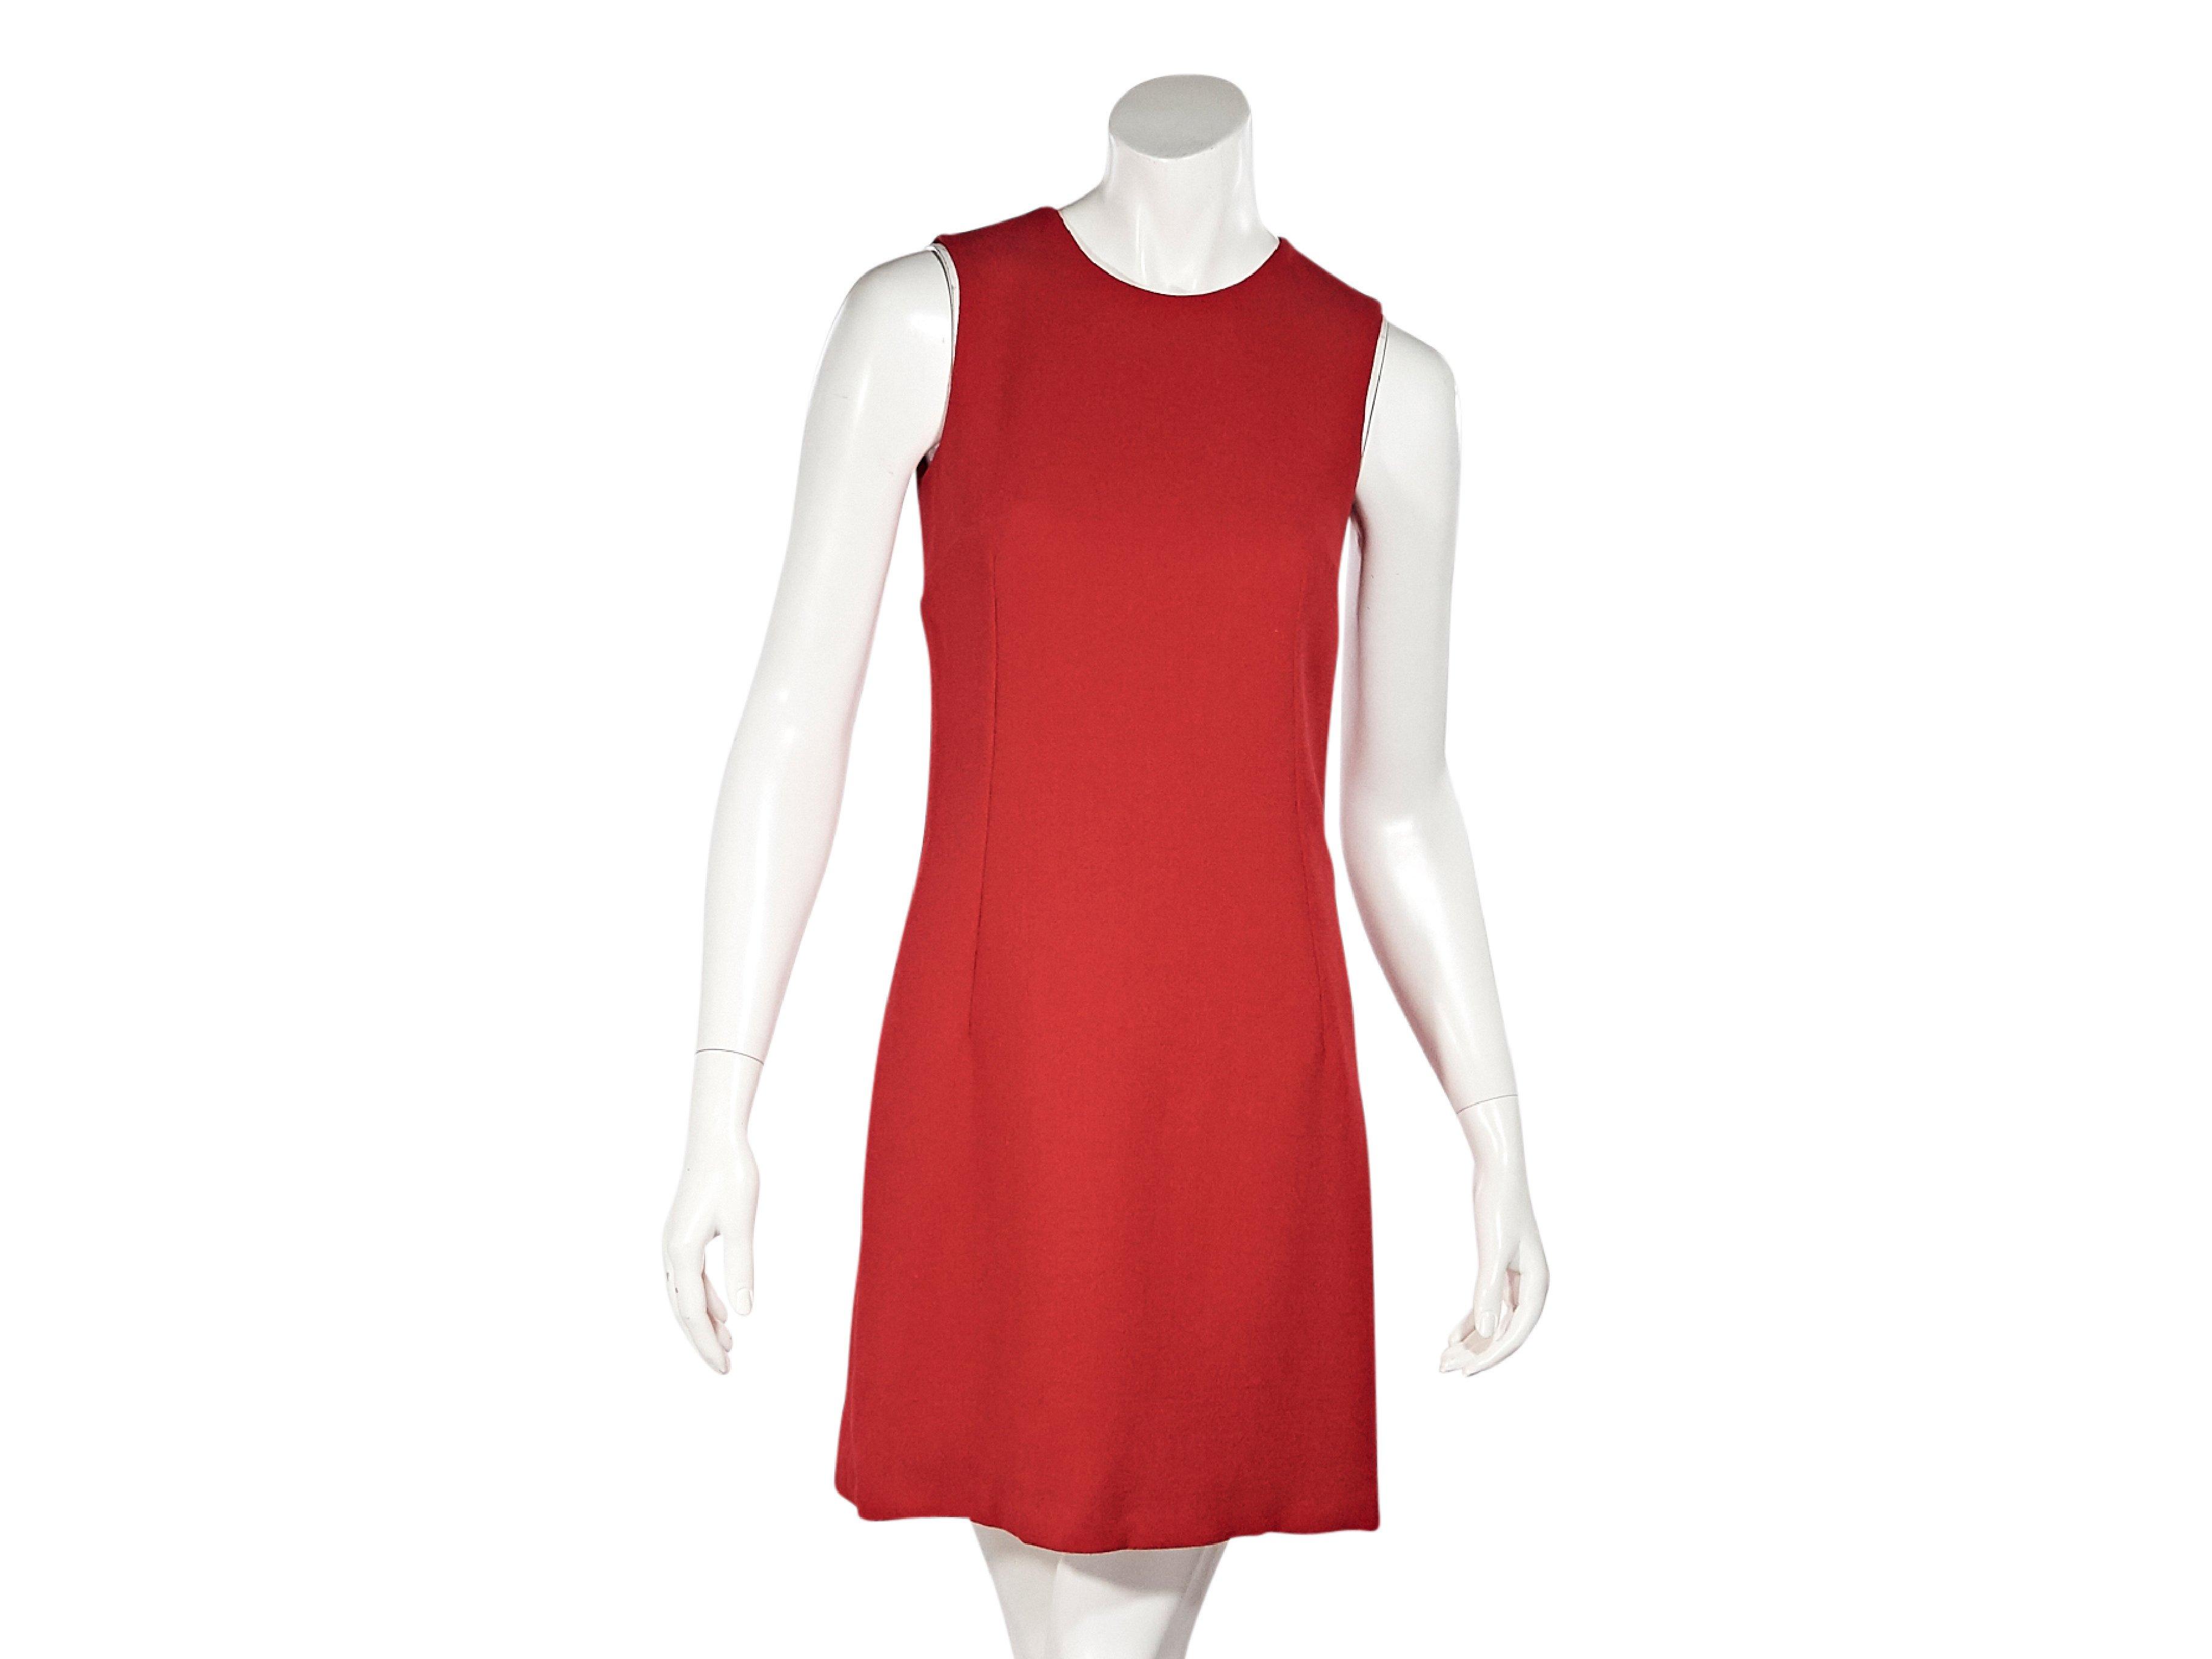 minimal bright red cocktail dress 80s red wool sheath dress small long sleeve minimalist dress red midi dress cherry red party dress